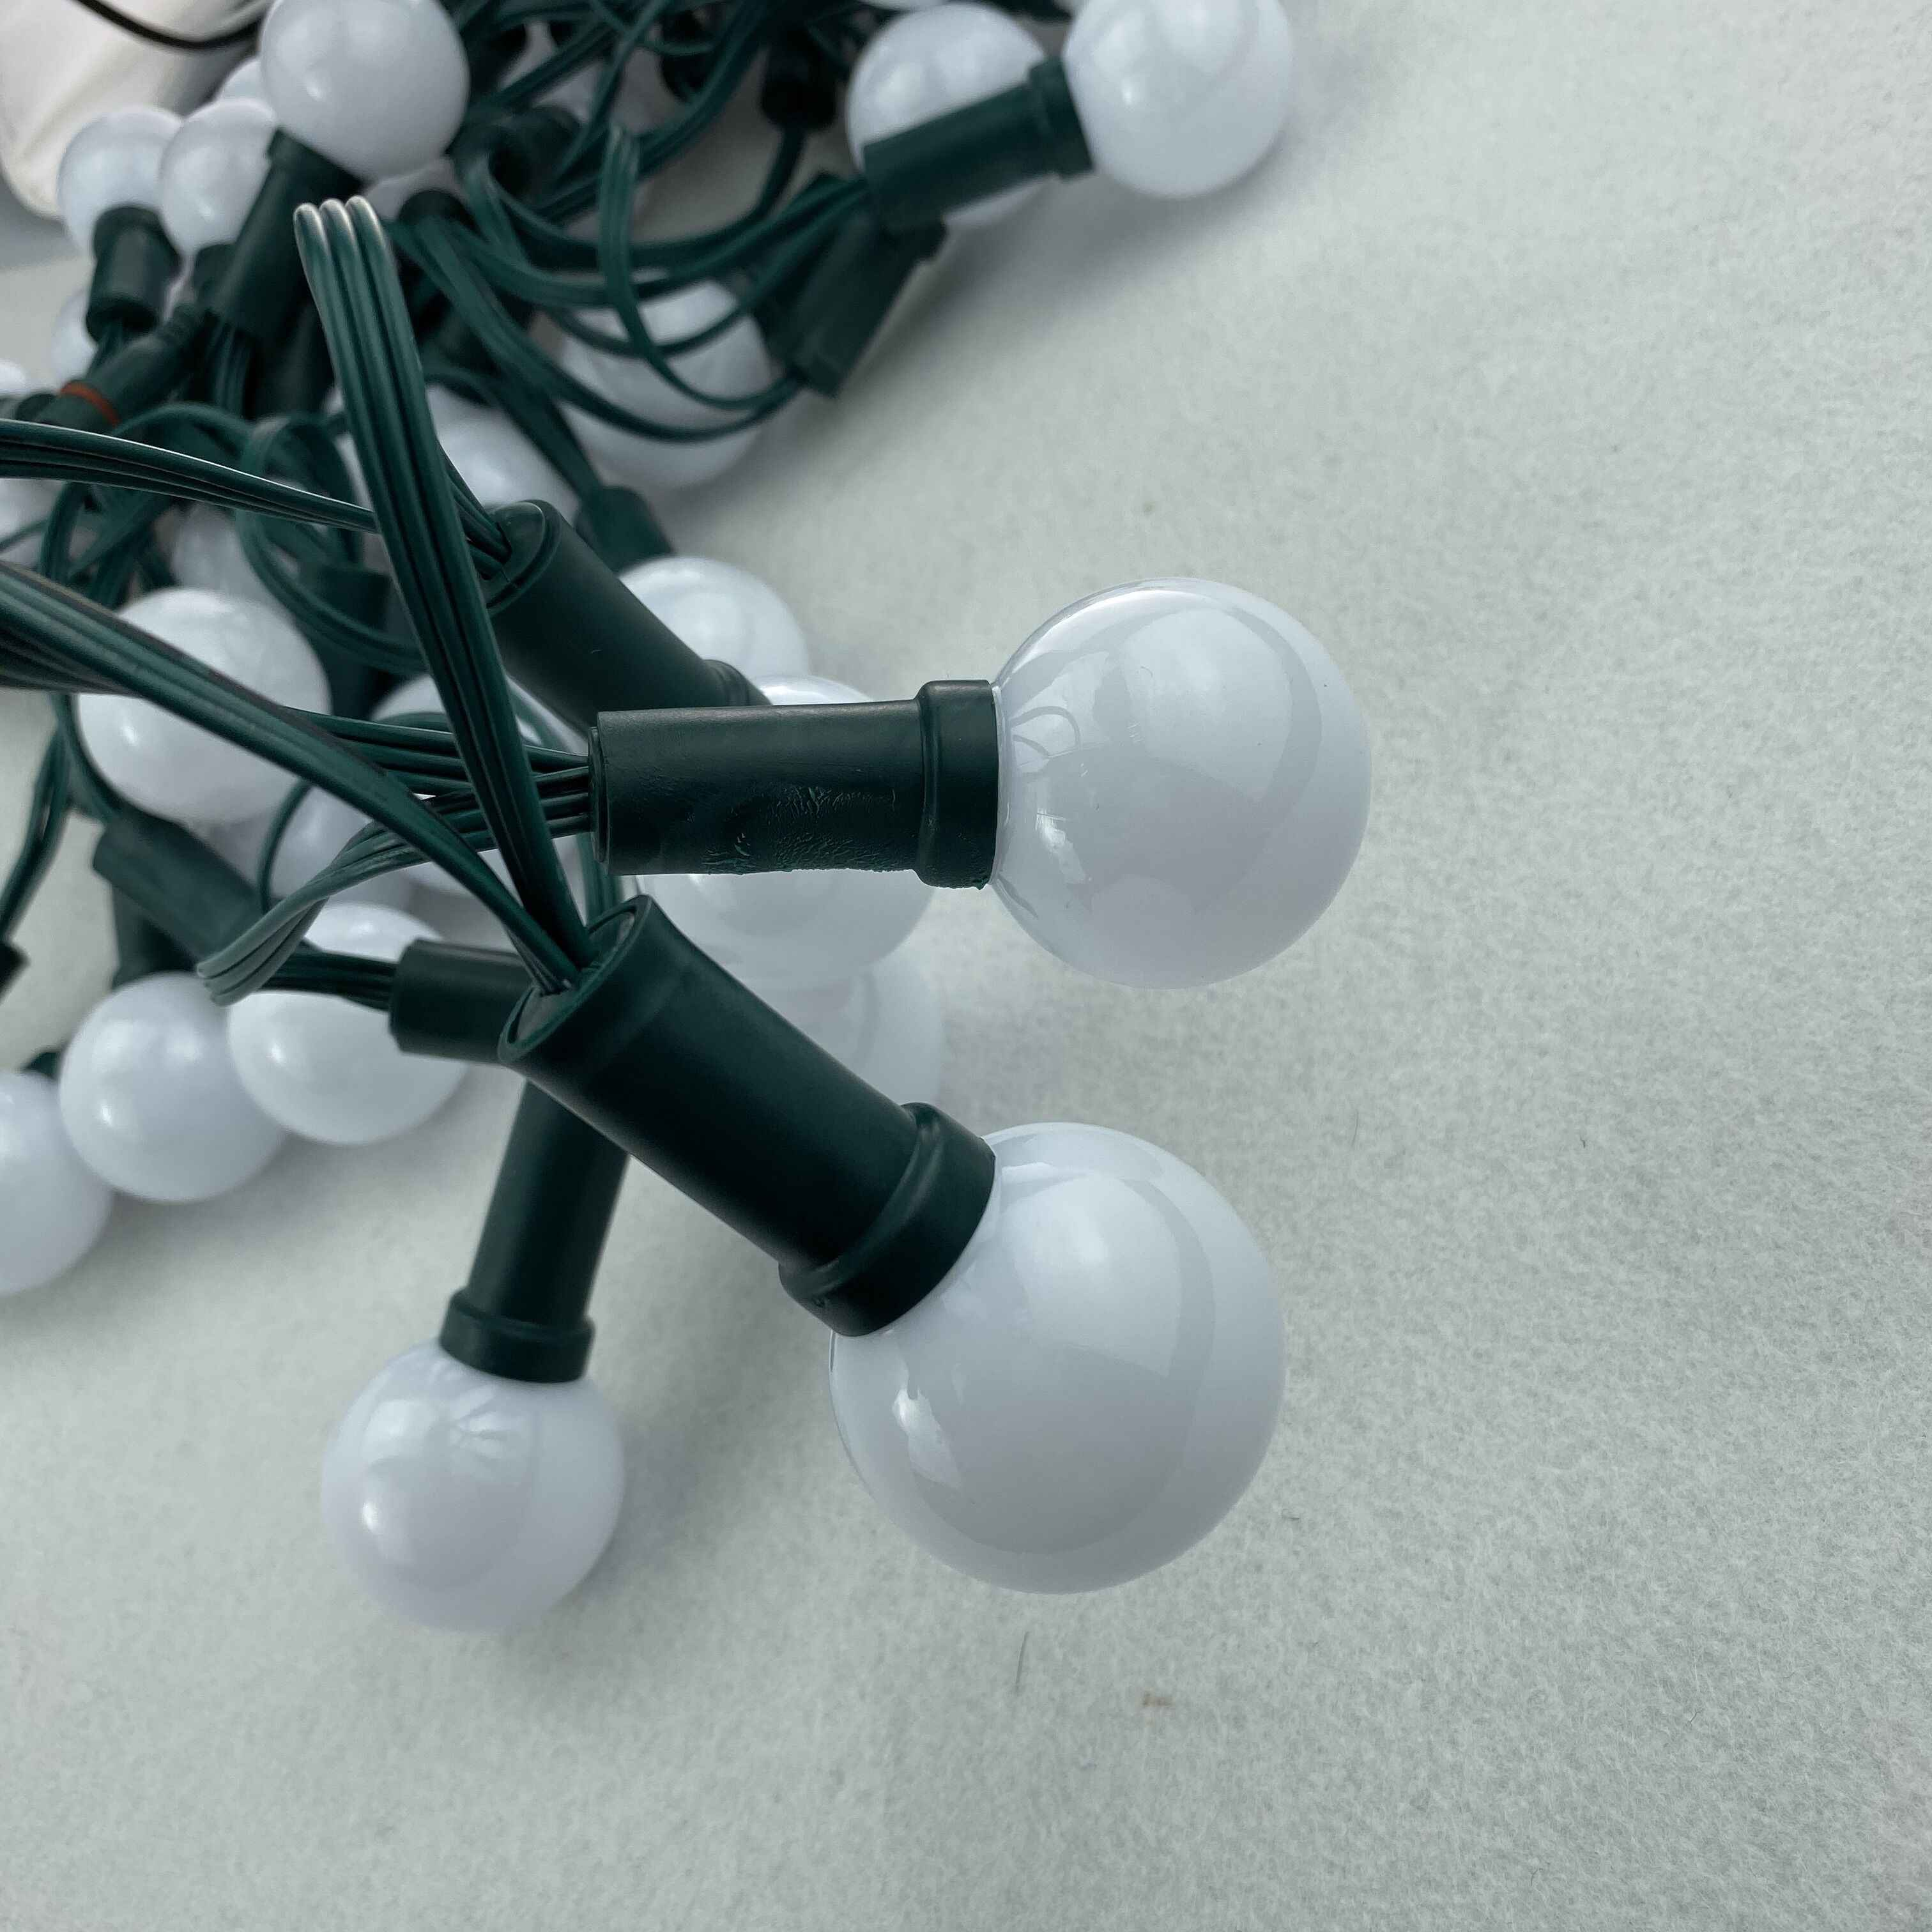 DC5V 50 düğümler adresli RGB G40 WS2811 LED noel piksel dizisi ışık; 6 inç (15 cm) tel aralığı; tüm yeşil tel; IP68